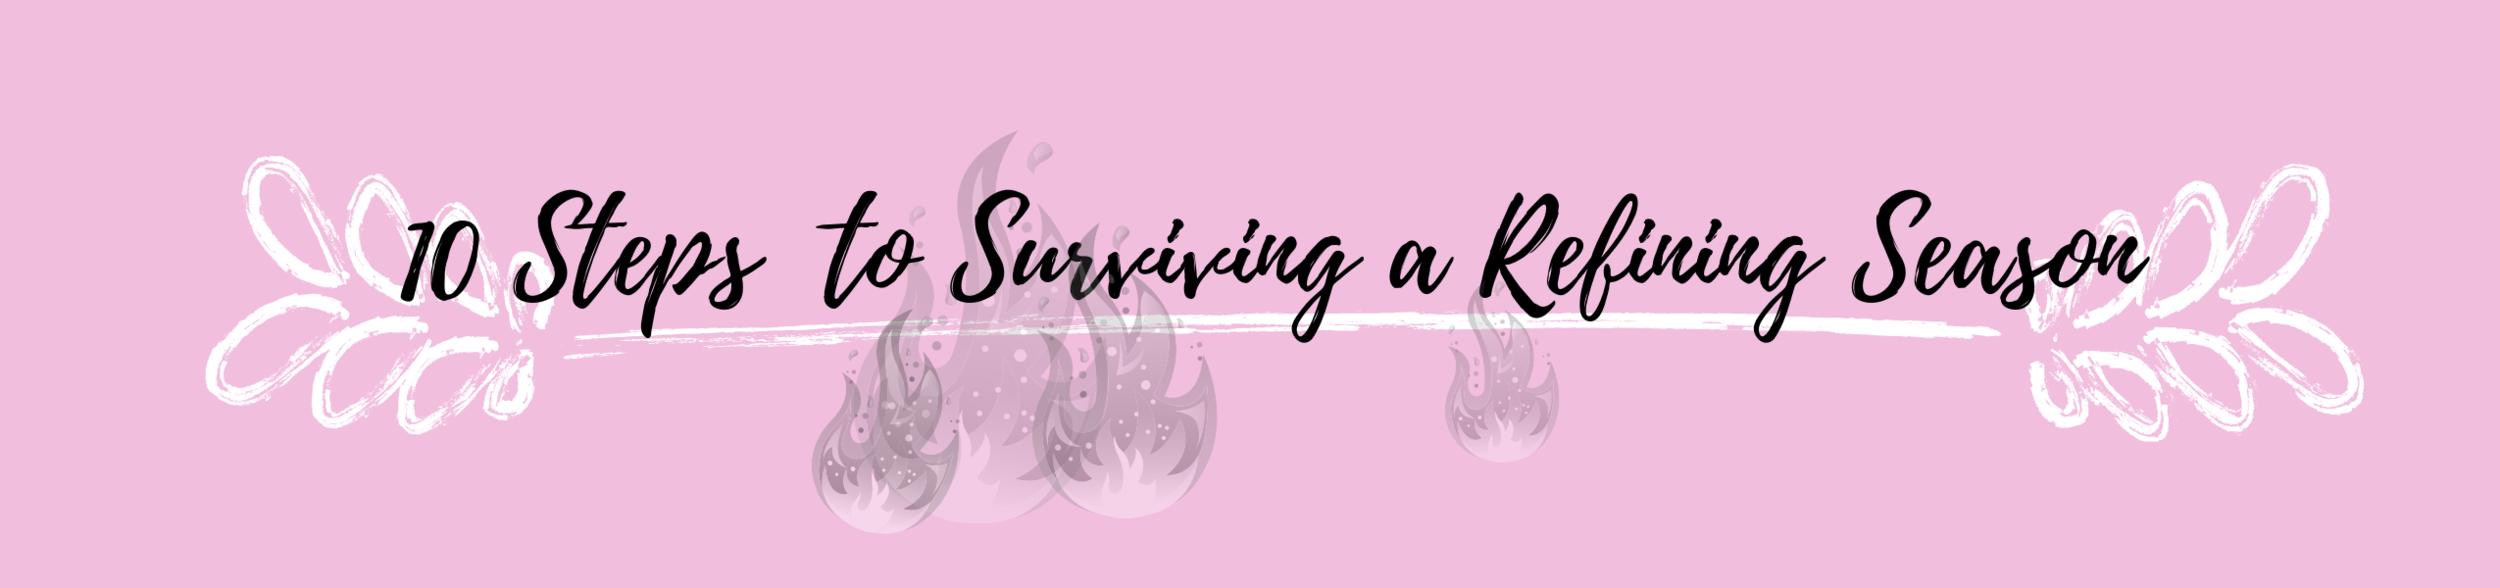 10 Steps to Surviving a Refining Season